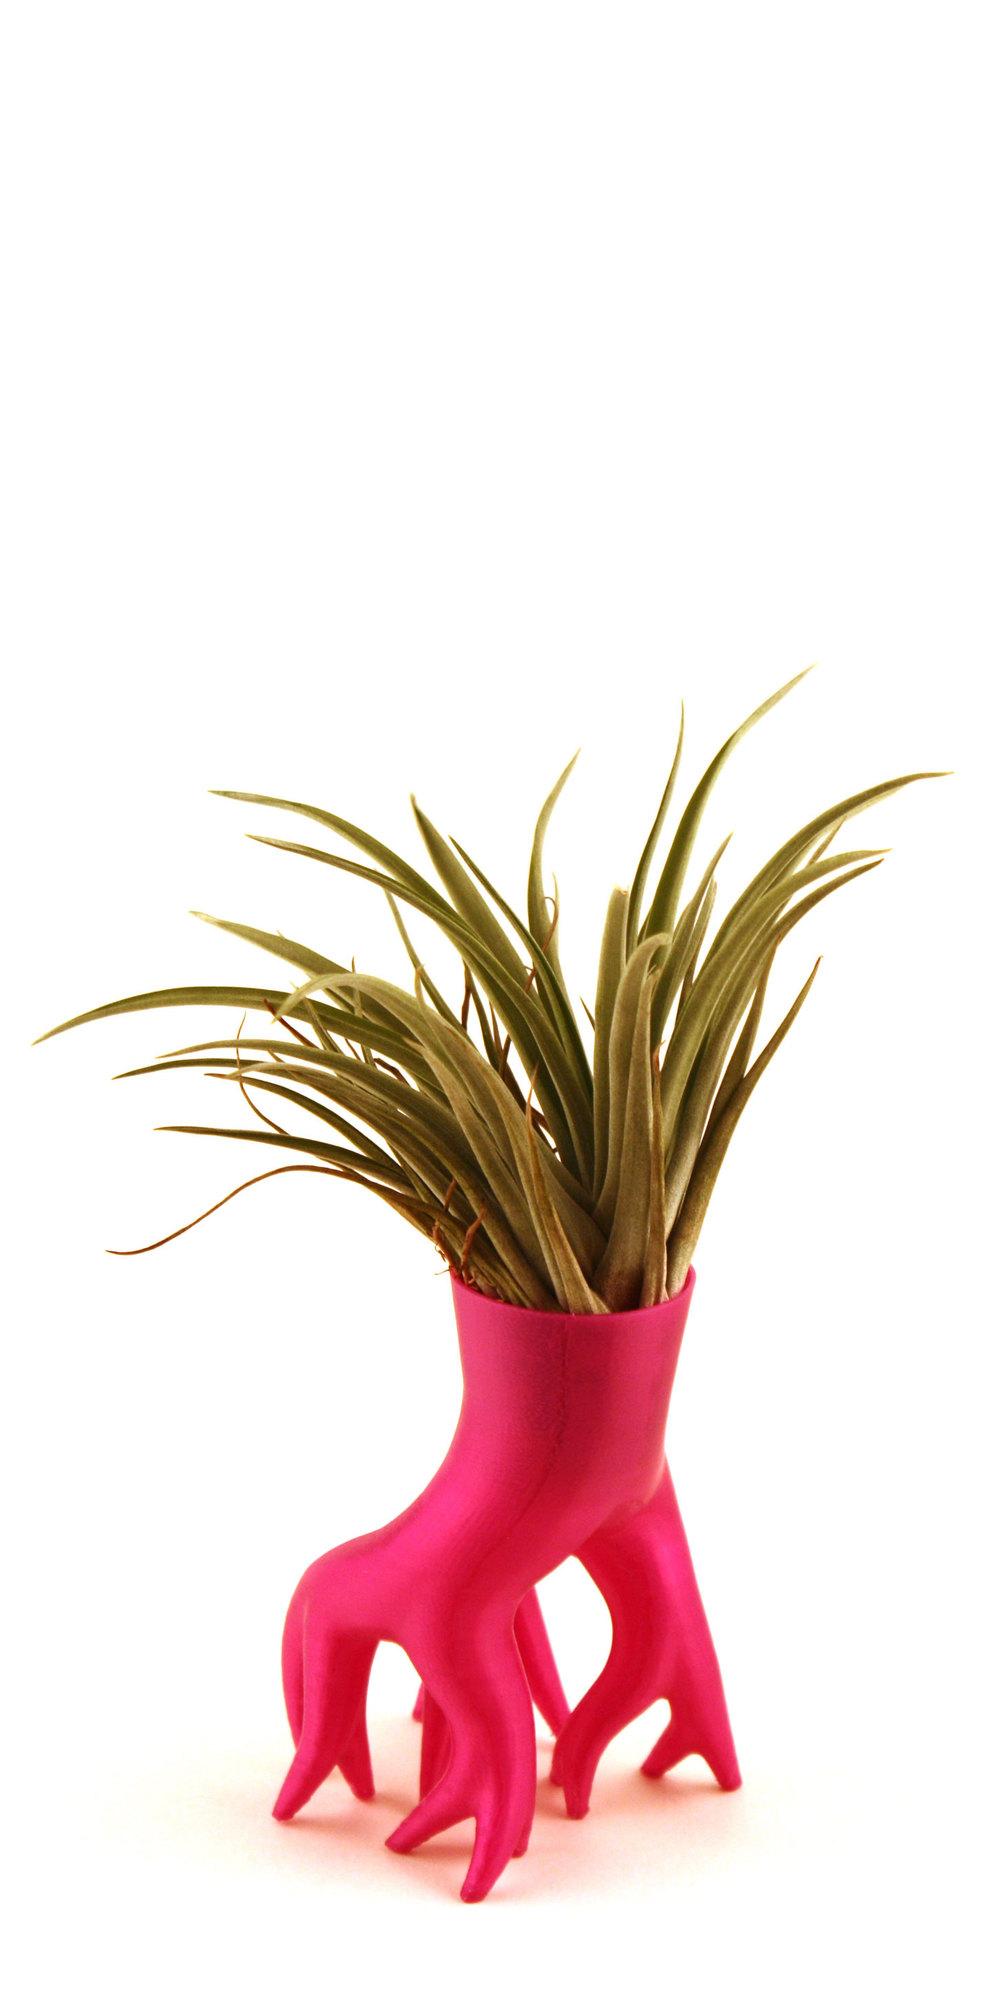 Mangrover, 3D printed pot